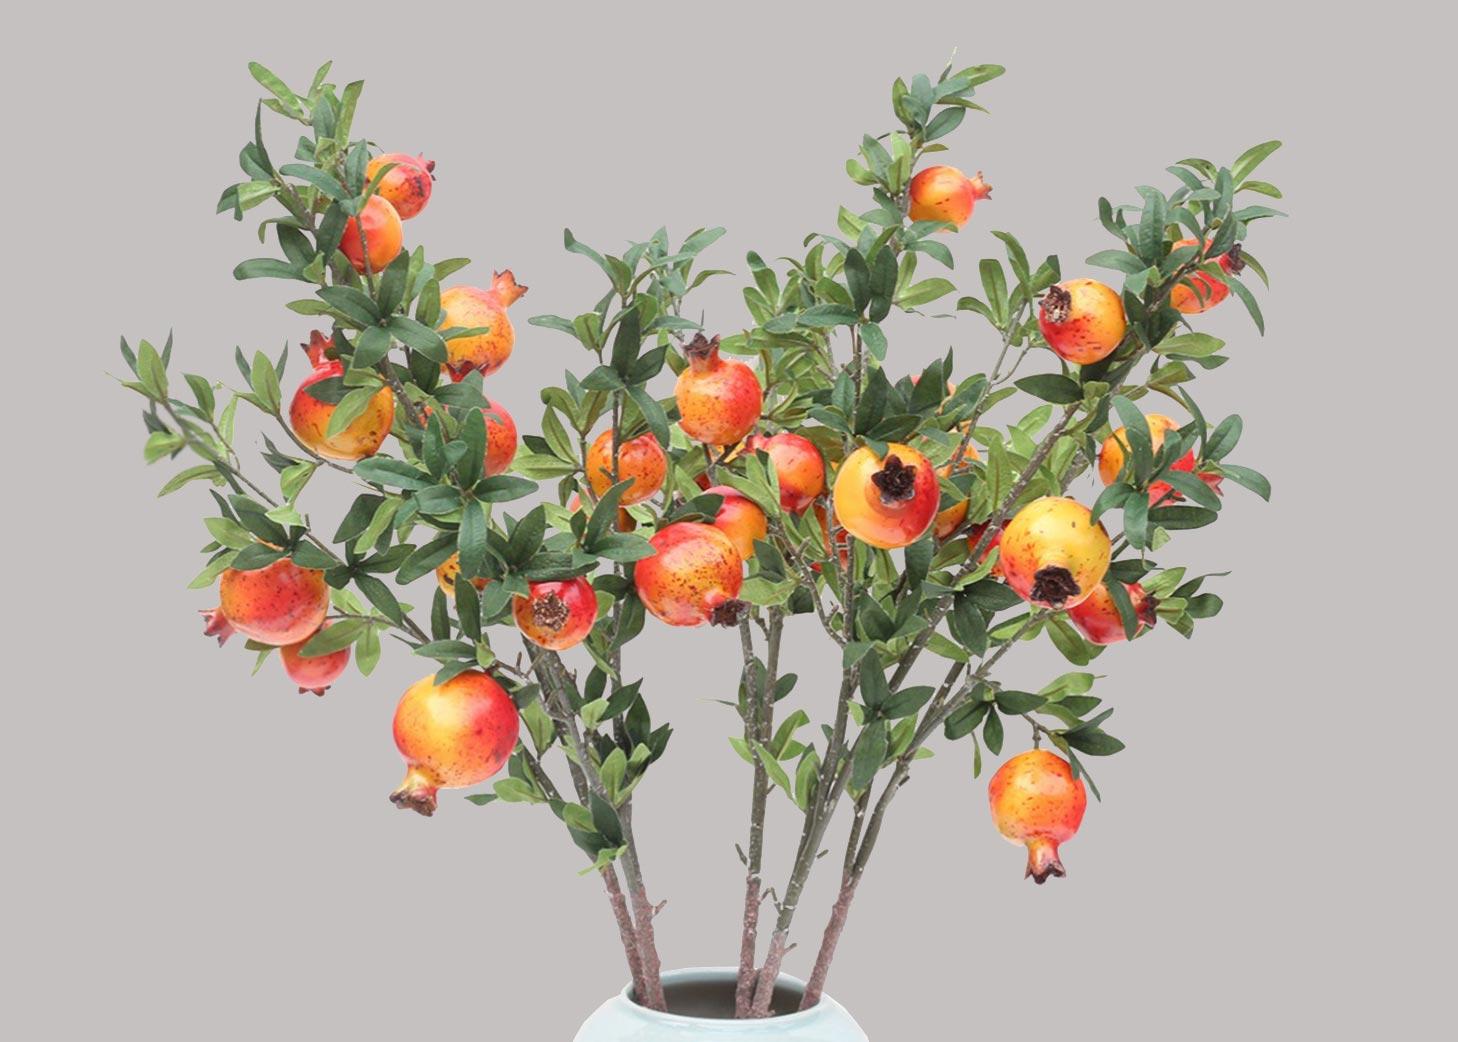 Pomegranate branches <br> กิ่งทับทิม <br> SKU: 11001 - Orange